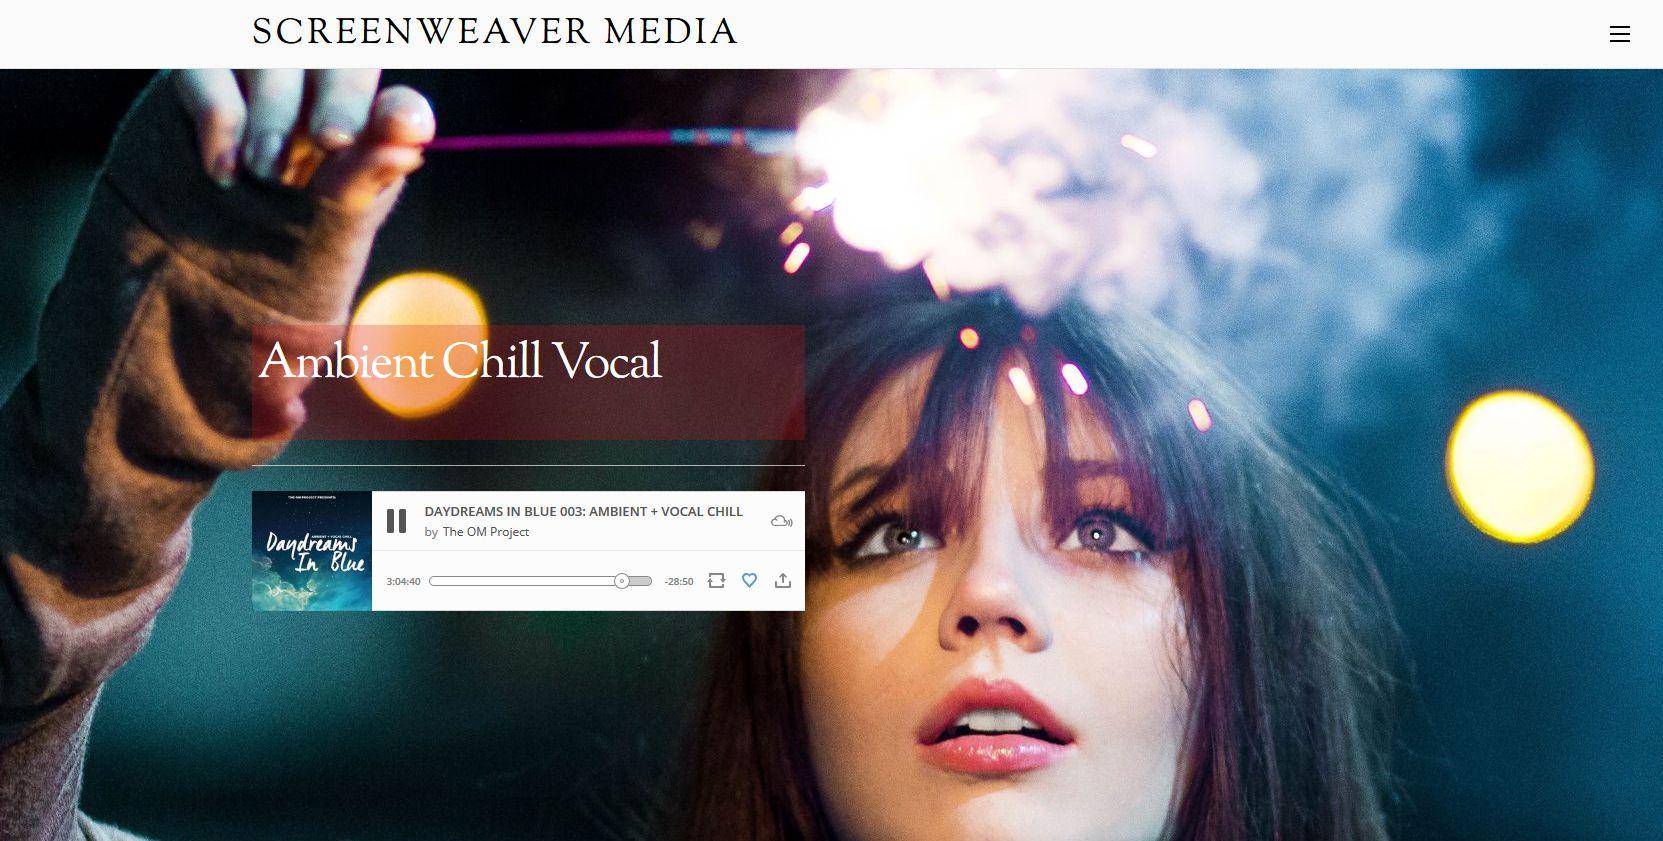 Ambient_Vocals_screenweaver_media_2017